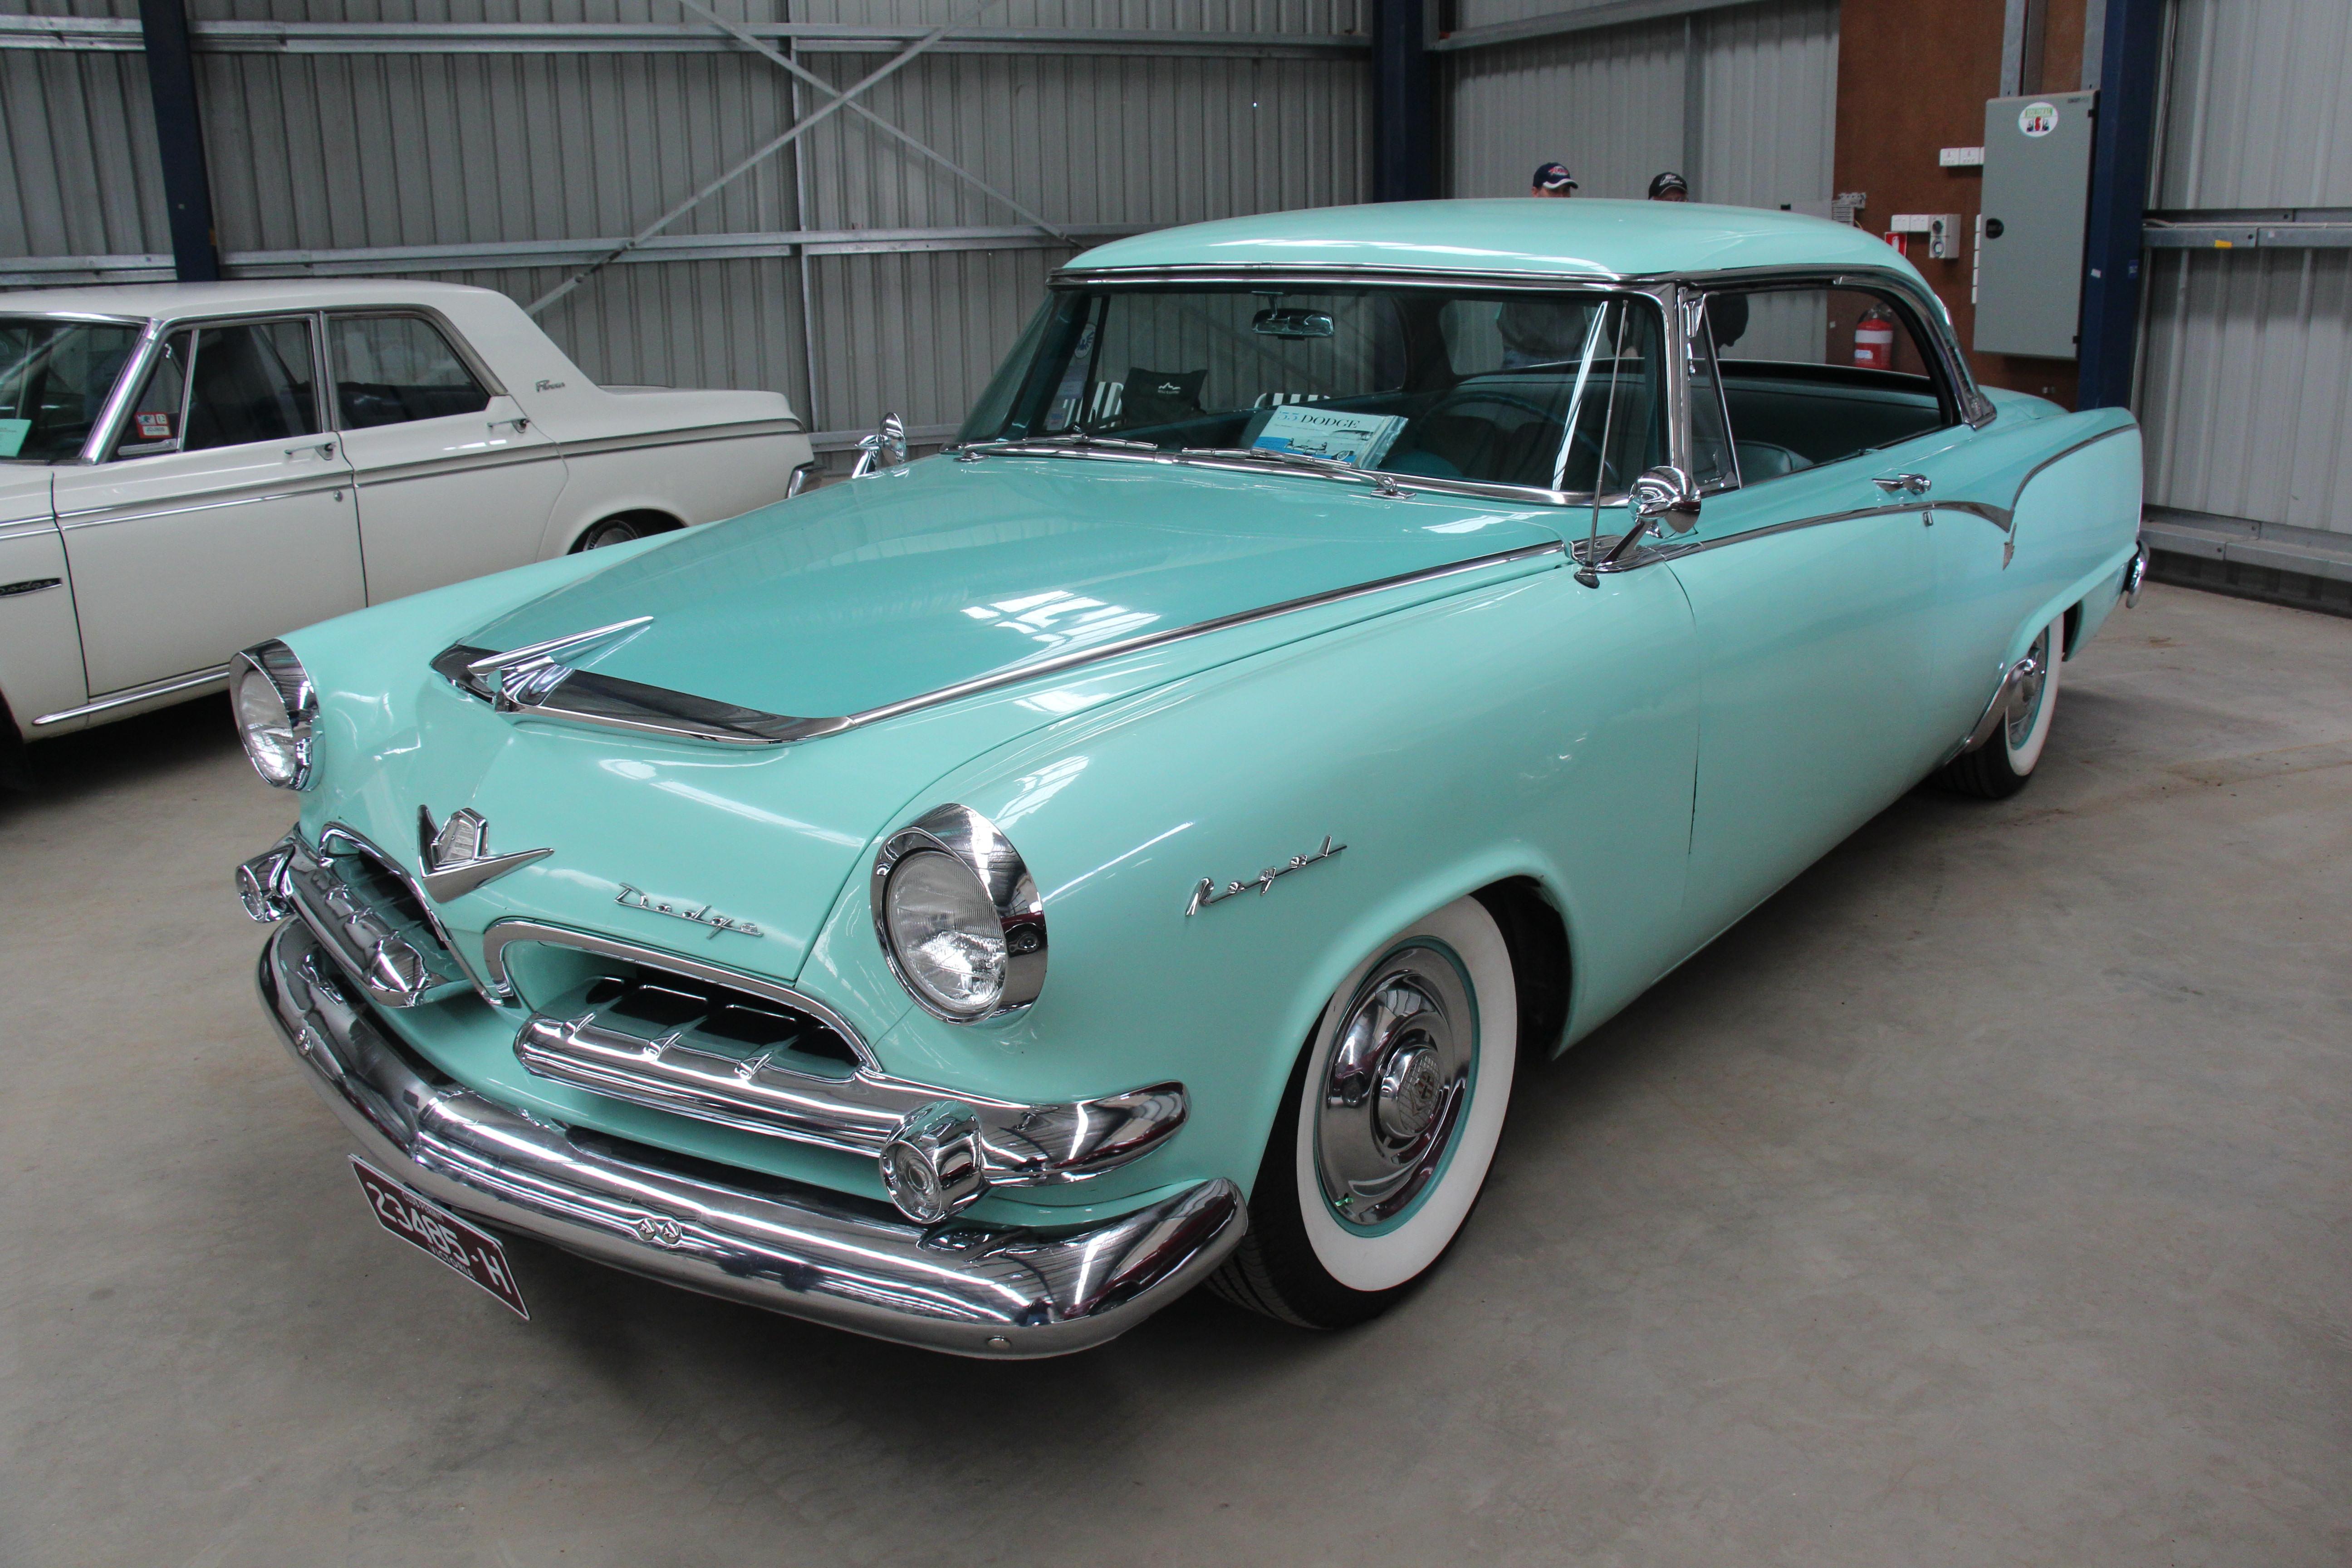 1955 dodge custom royal lancer 4 door sedan 15699 - 1955 Dodge Royal 2 Door Hardtop 15288355449jpg 5184x3456